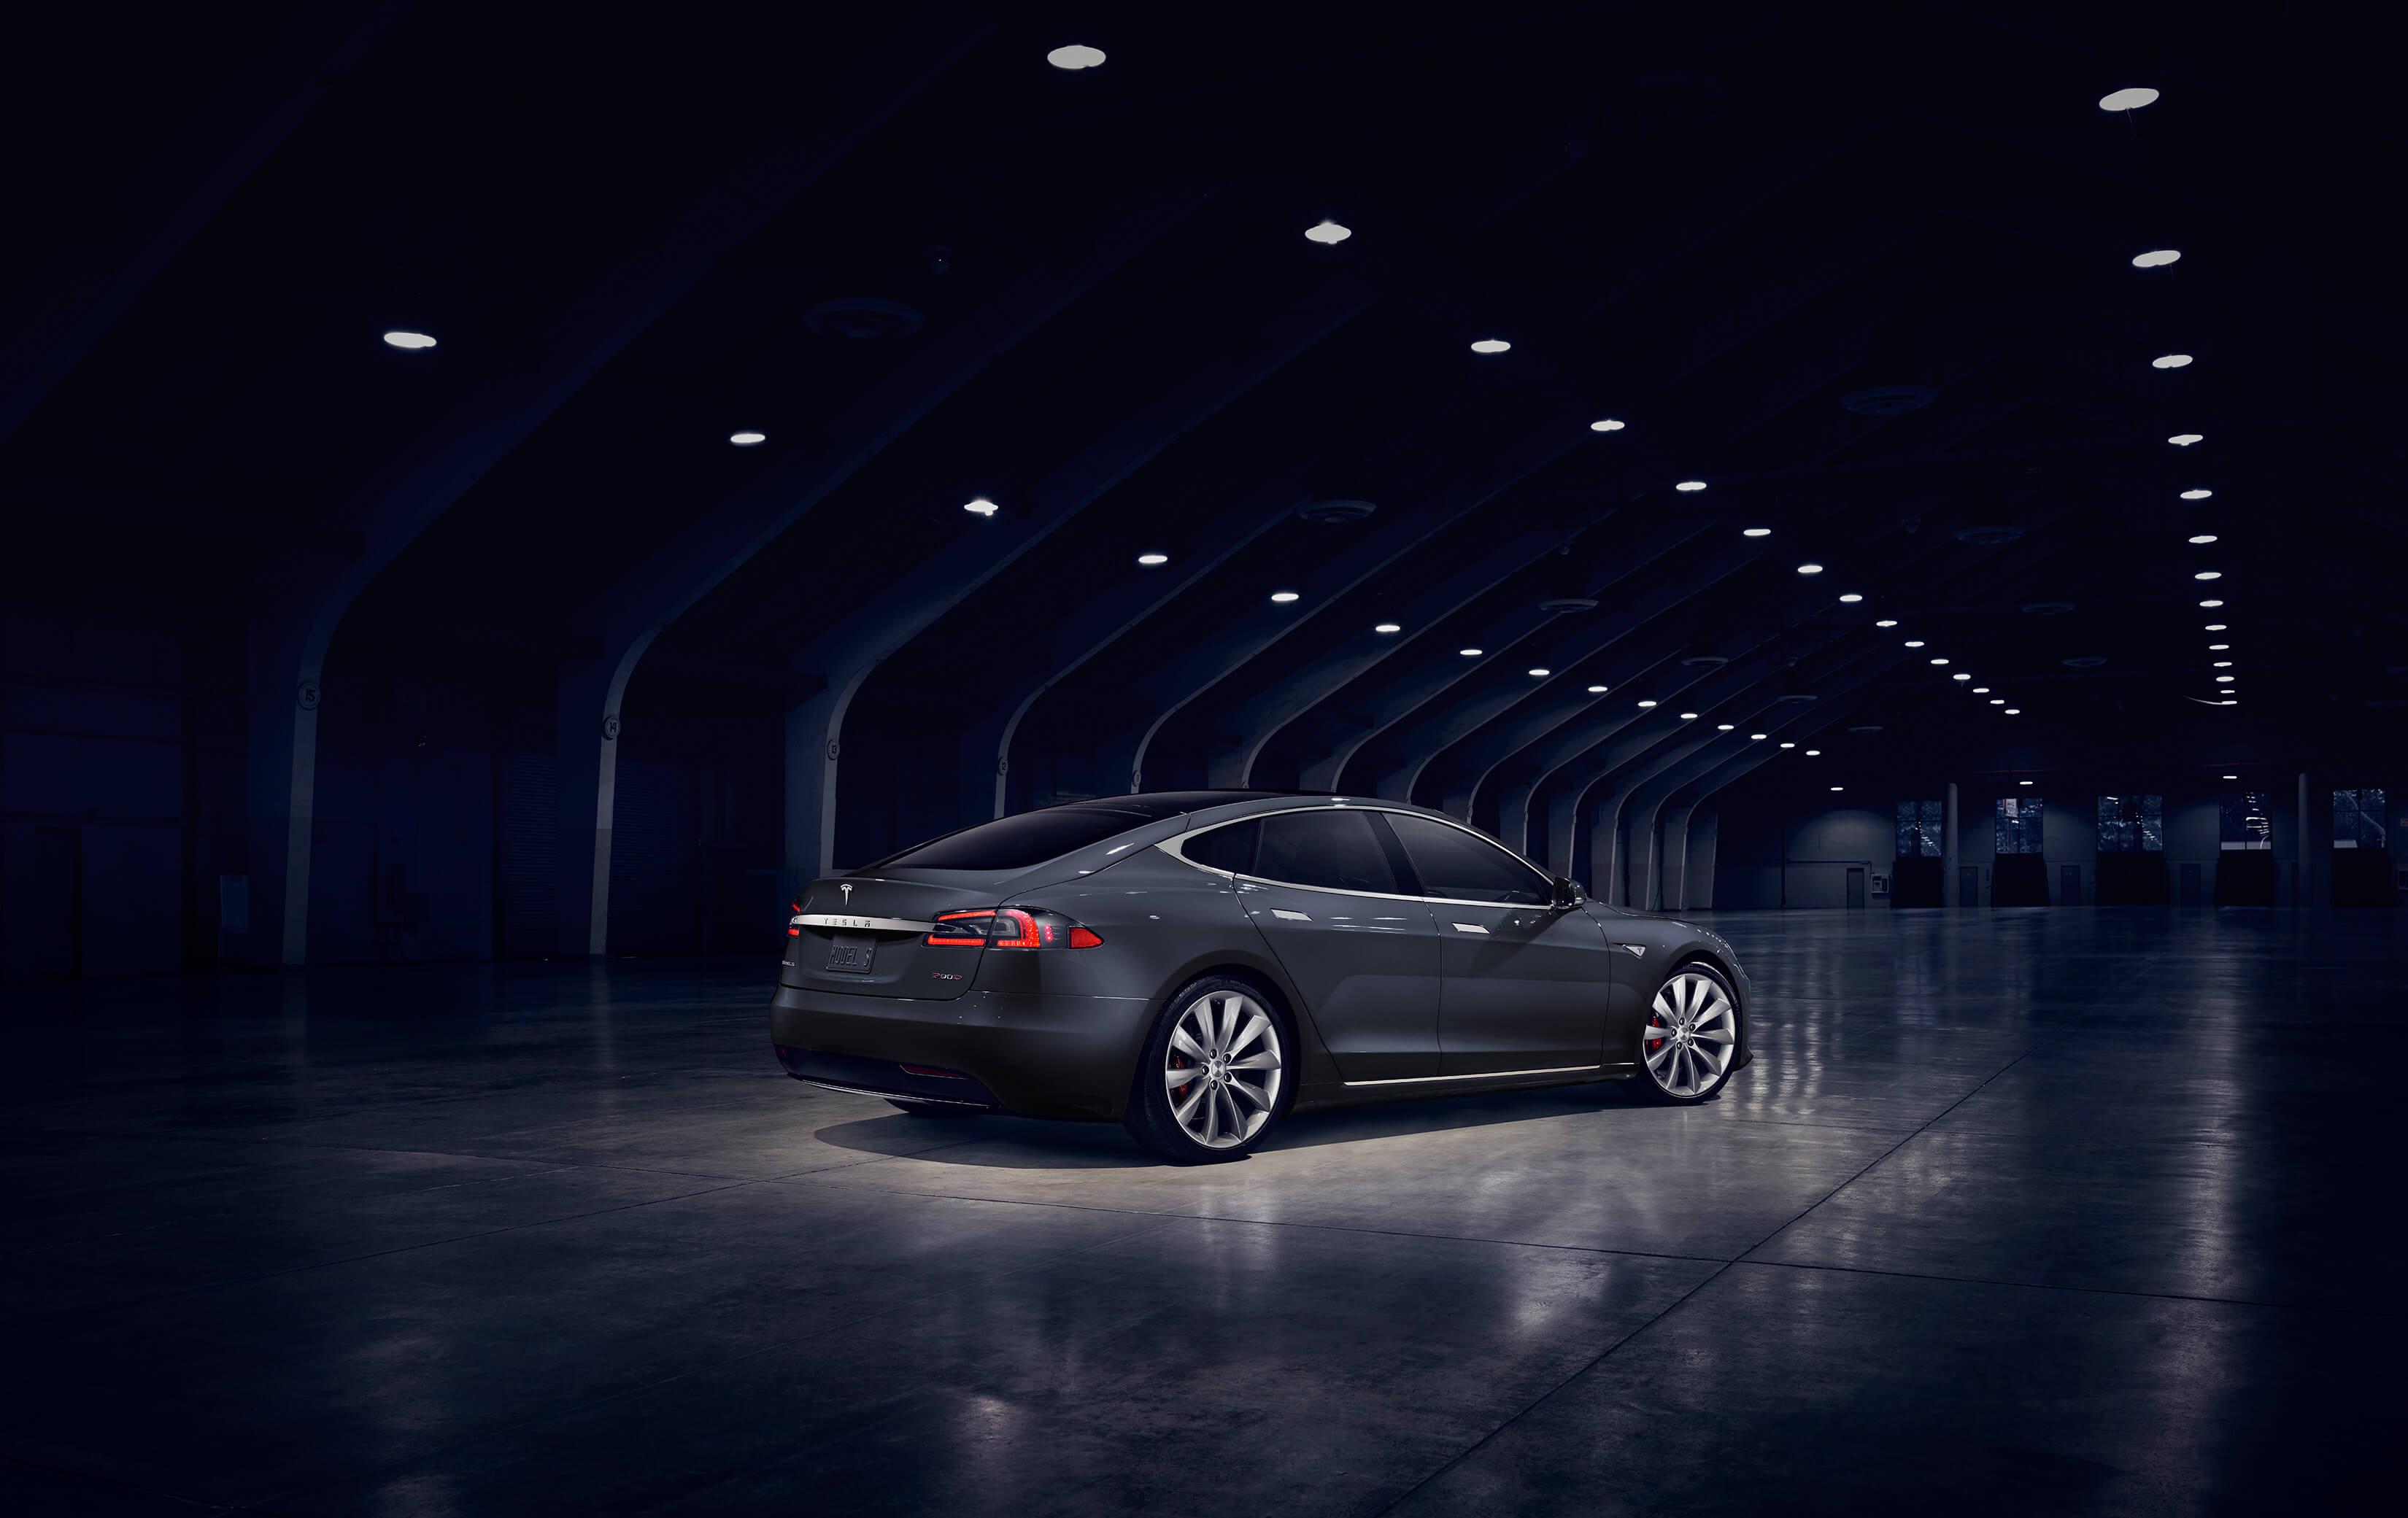 Tesla-Model-S-coches-electricos-del-salon-del-automovil-de-Madrid-13